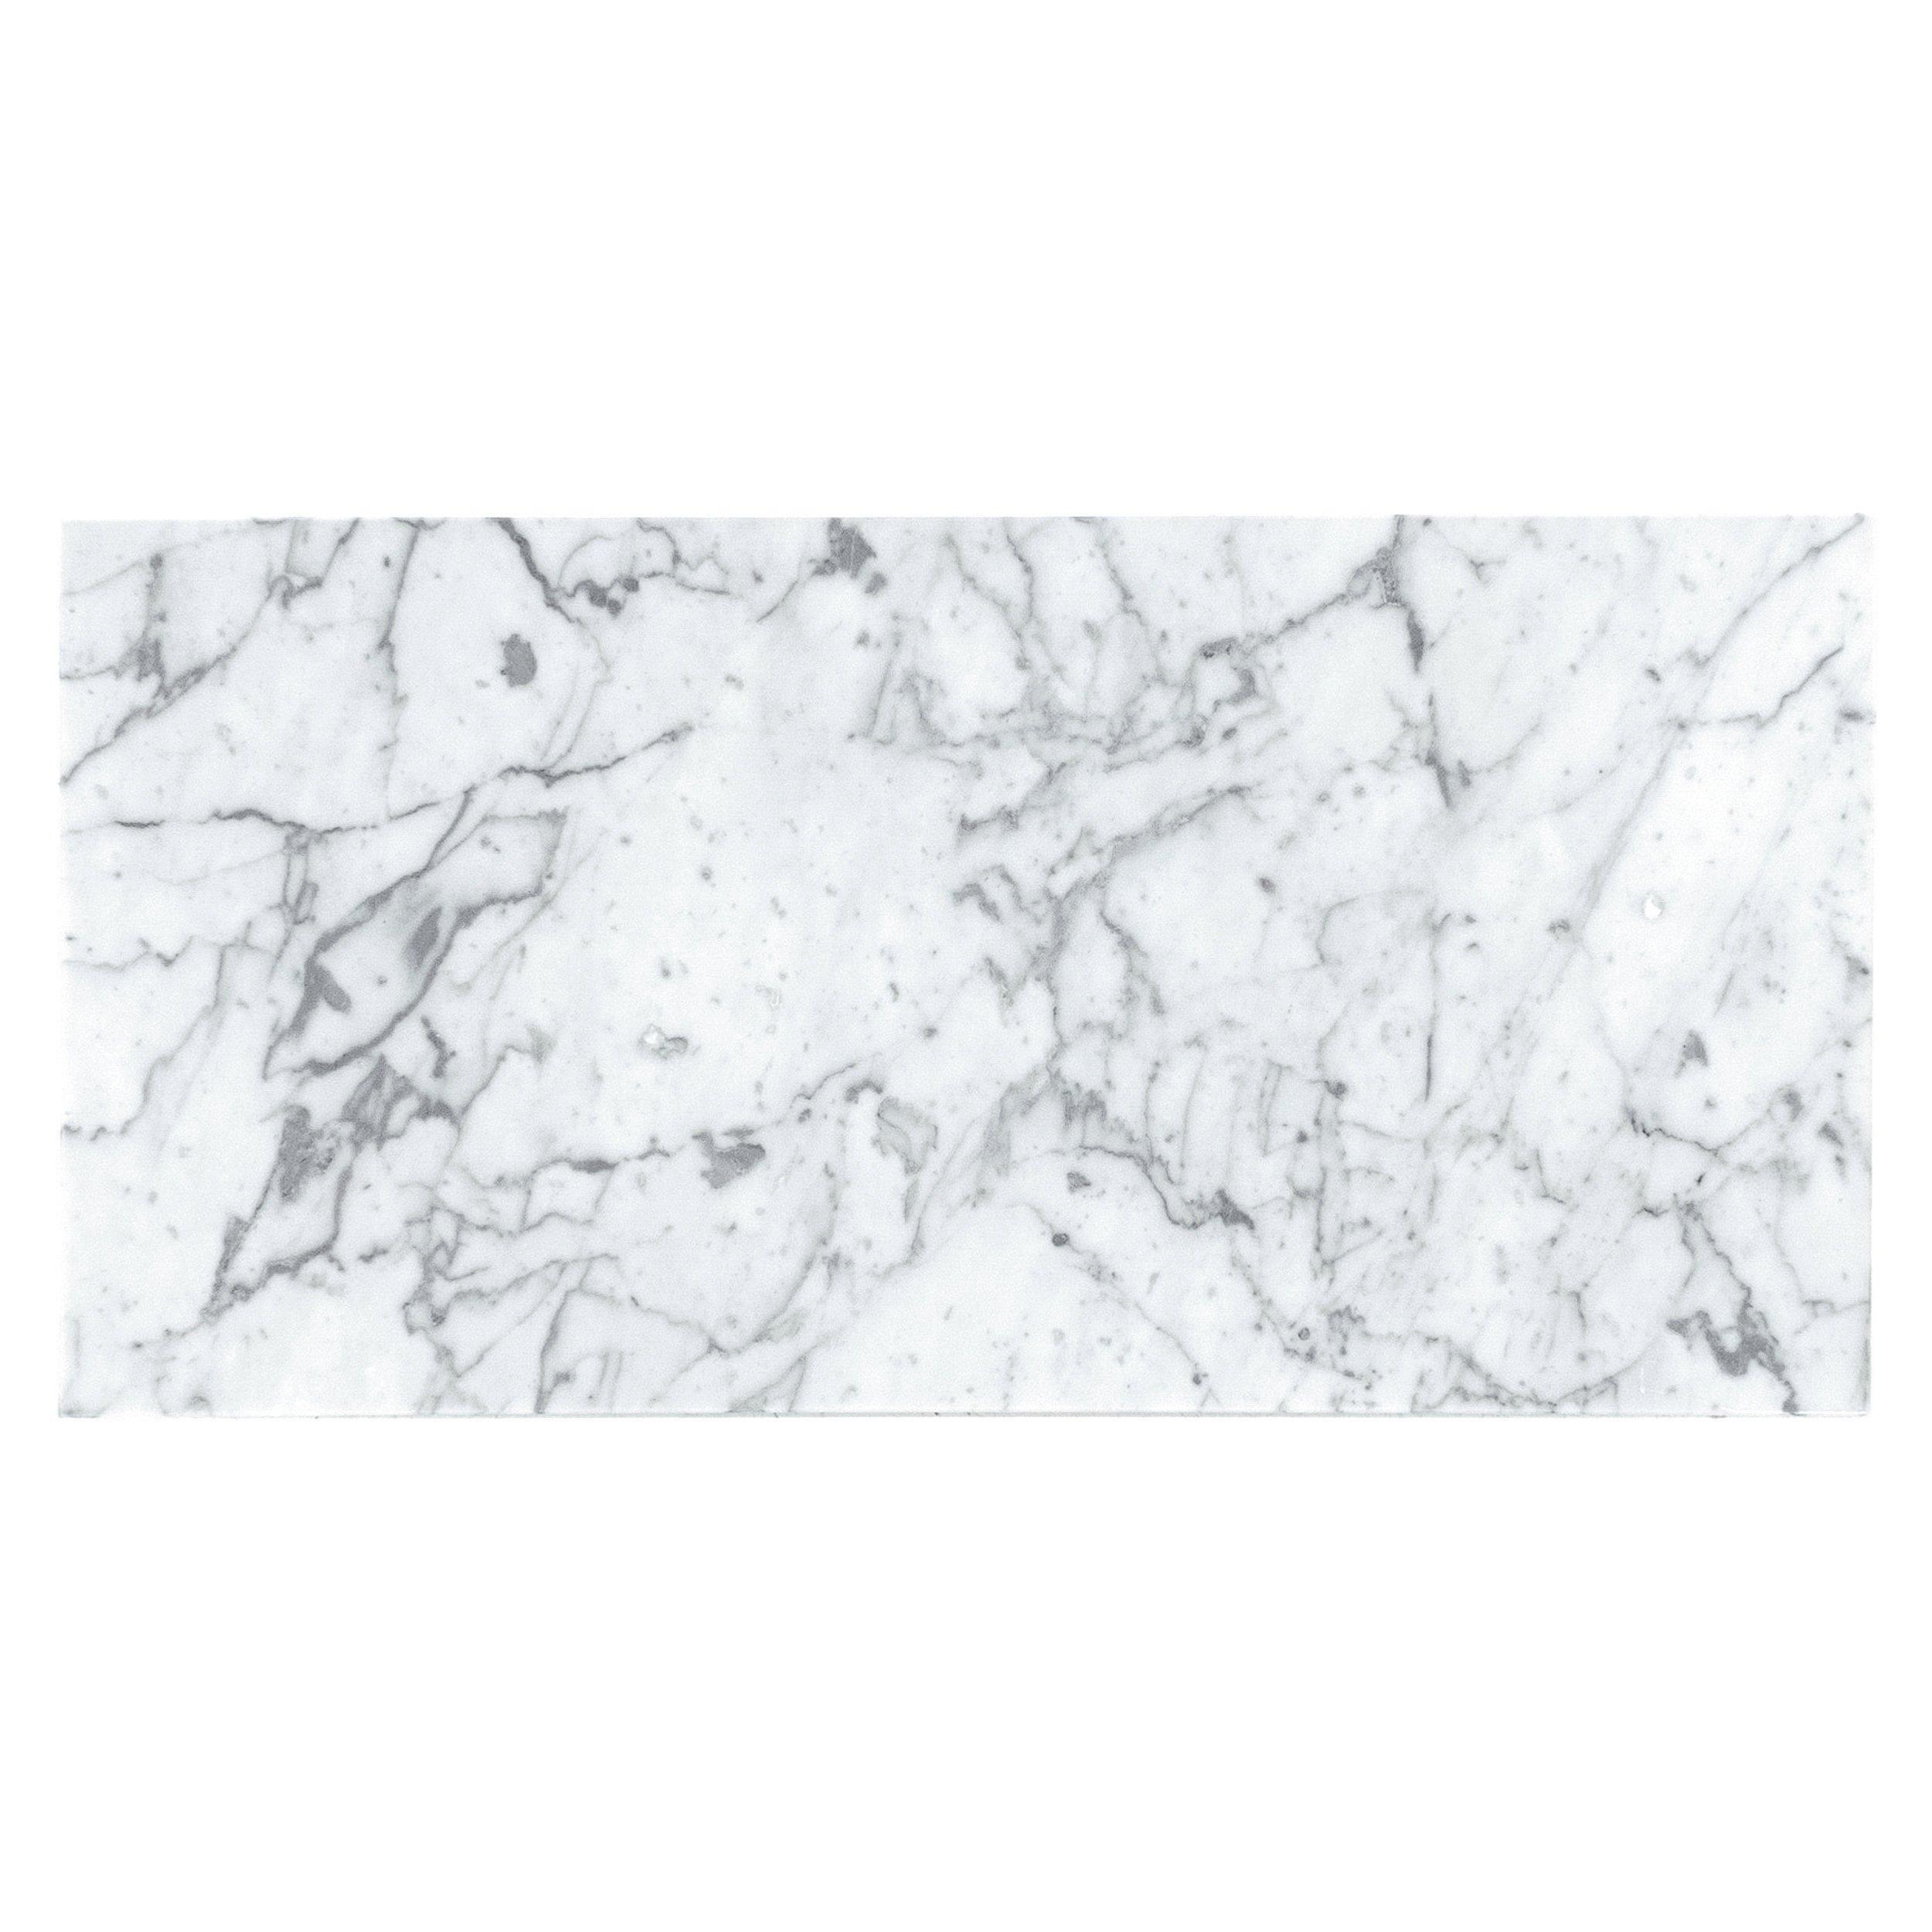 Bianco Carrara Honed Marble Tile Floor Decor In 2020 Honed Marble Tiles Honed Marble Bianco Carrara